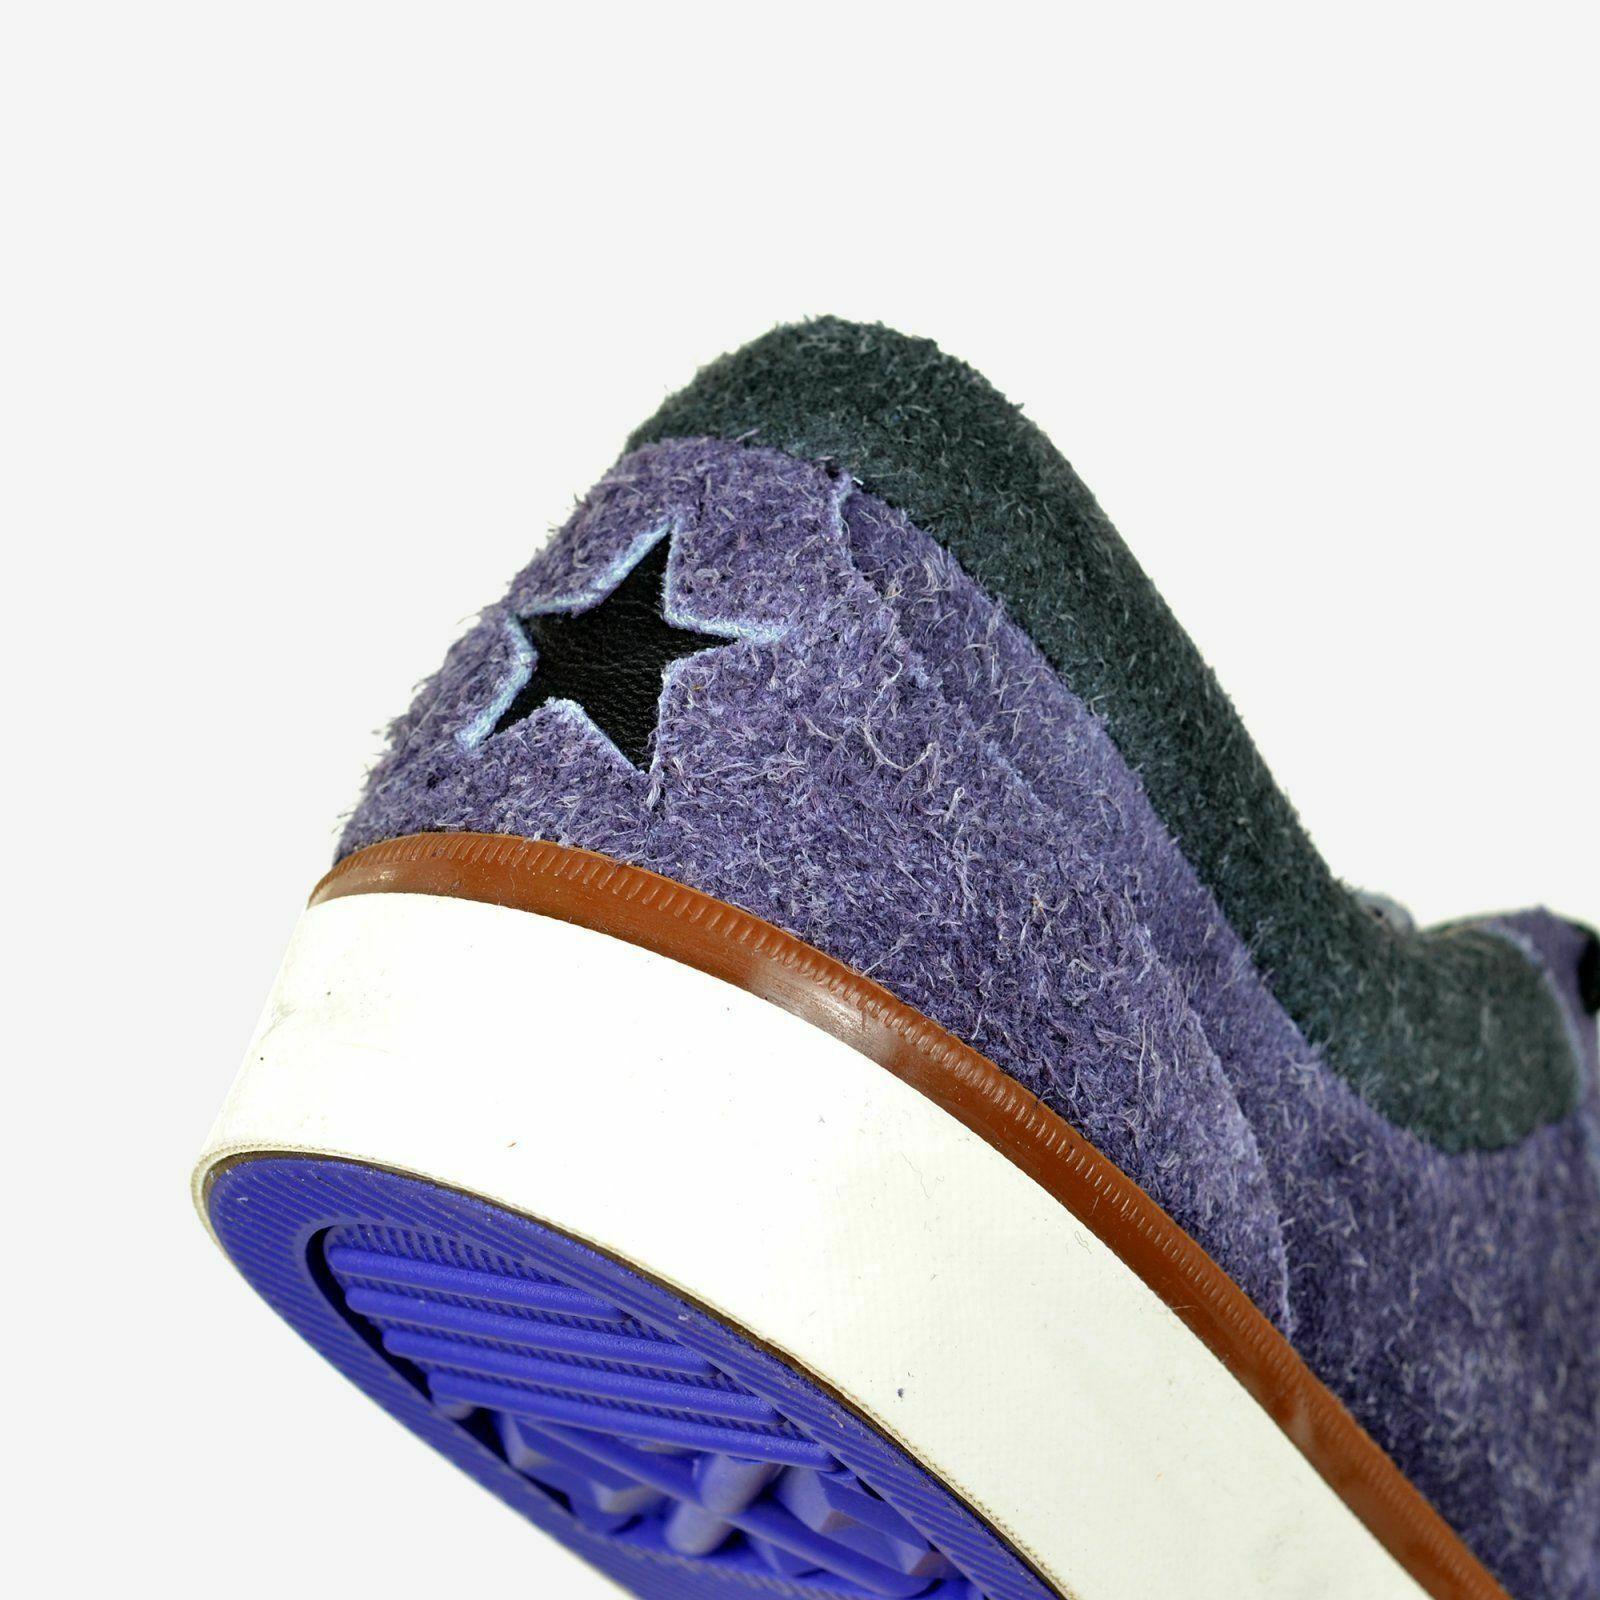 Converse X Clot One Star CC Ox 161300C Purple Velvet/Egret/Black Various Sizes